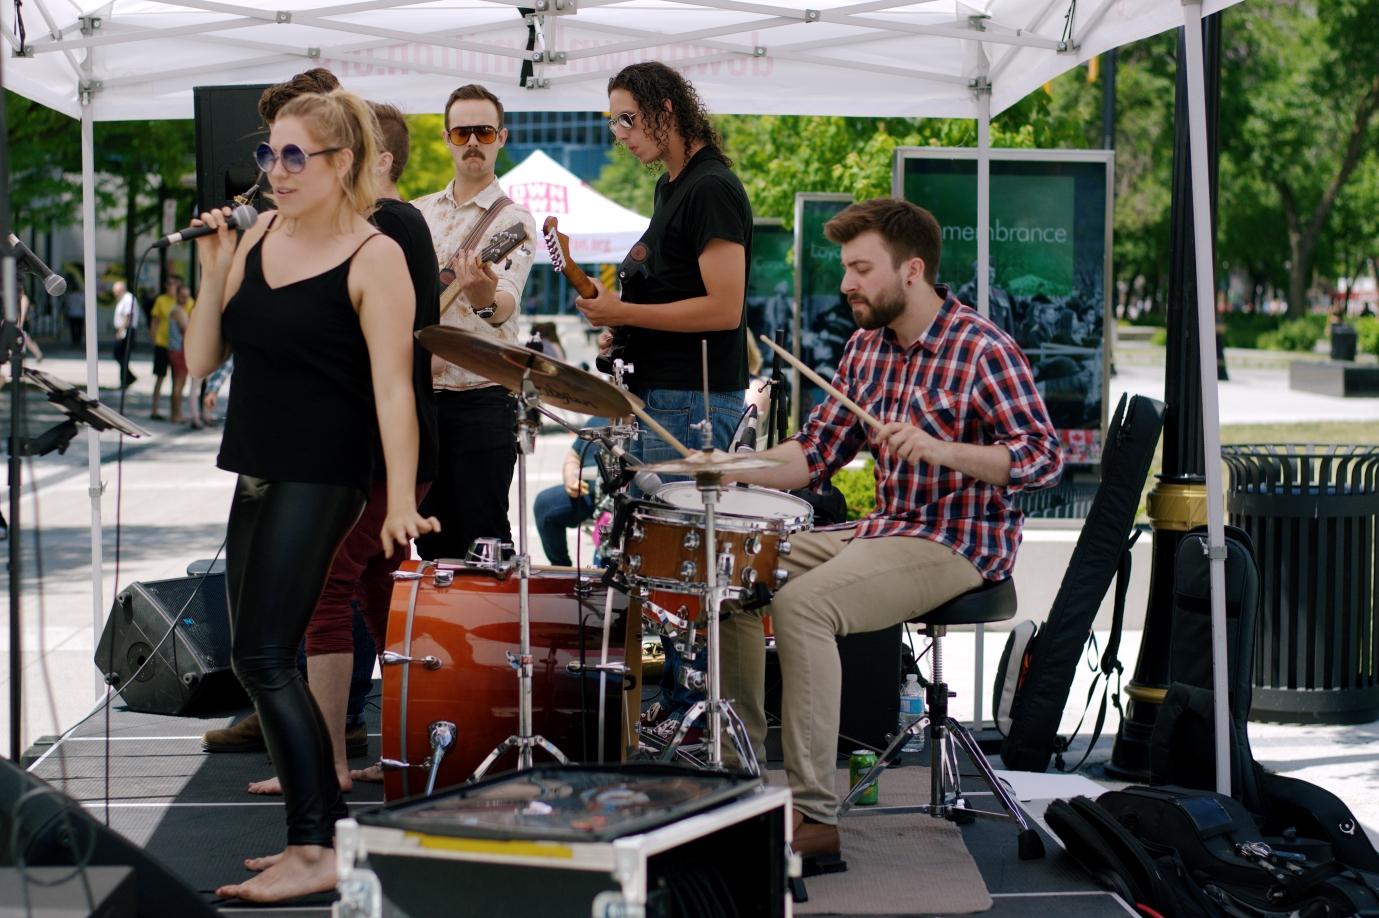 Jennifer Budd & band performing in Gore Park. Photo by Lisa Vuyk